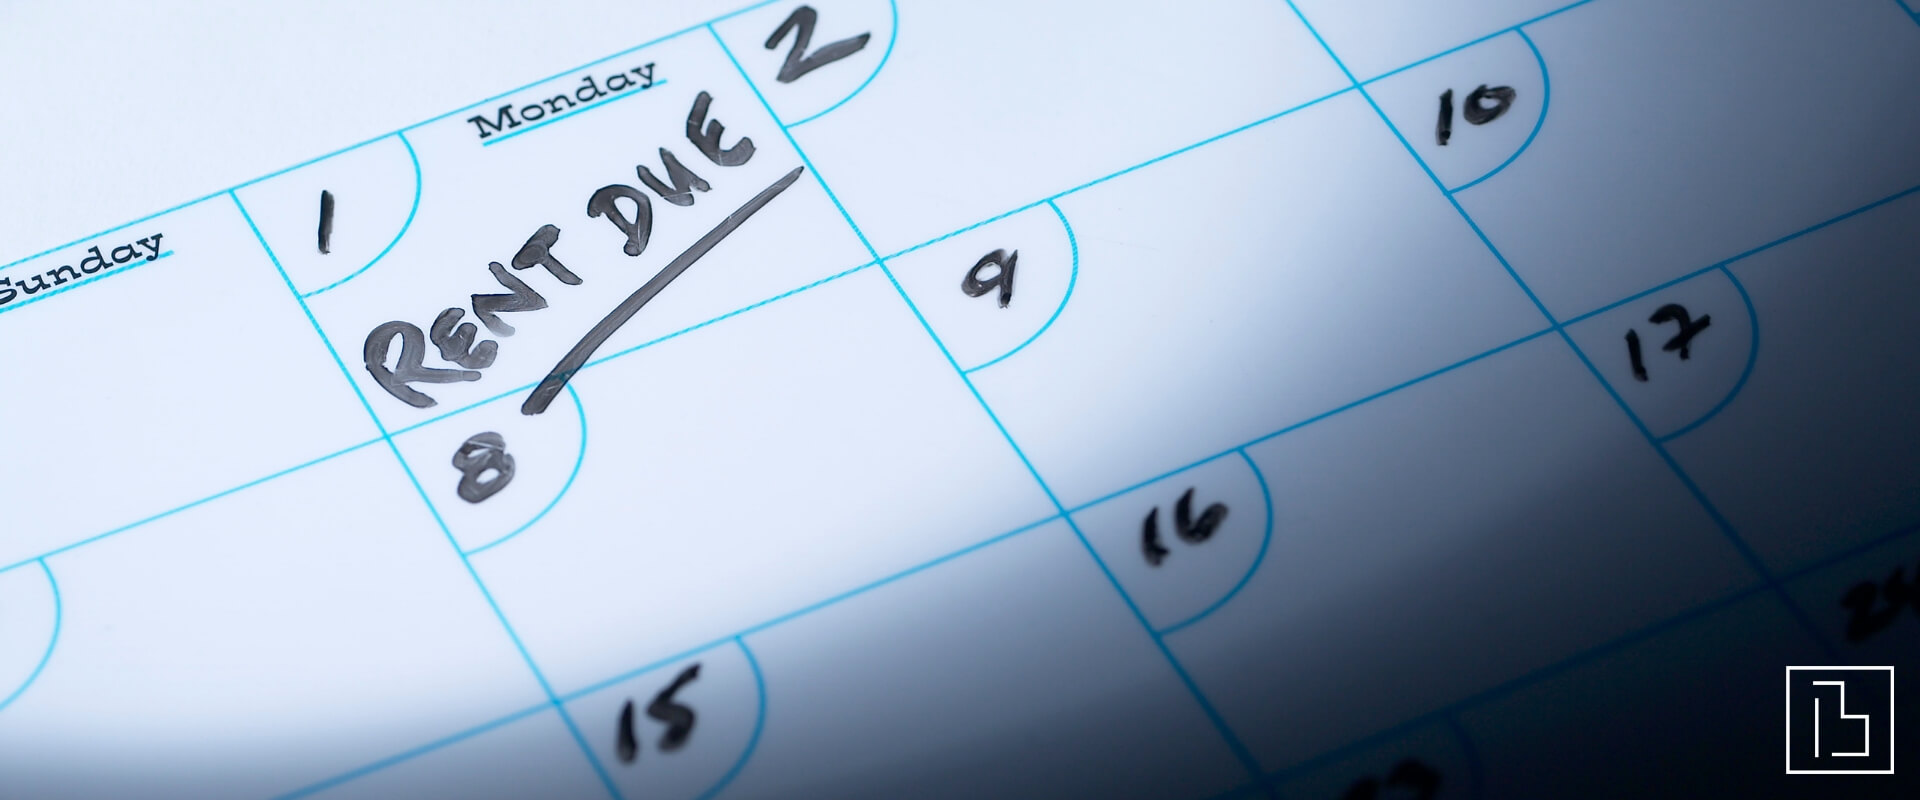 Calendar with rent due - Beachworks LLC